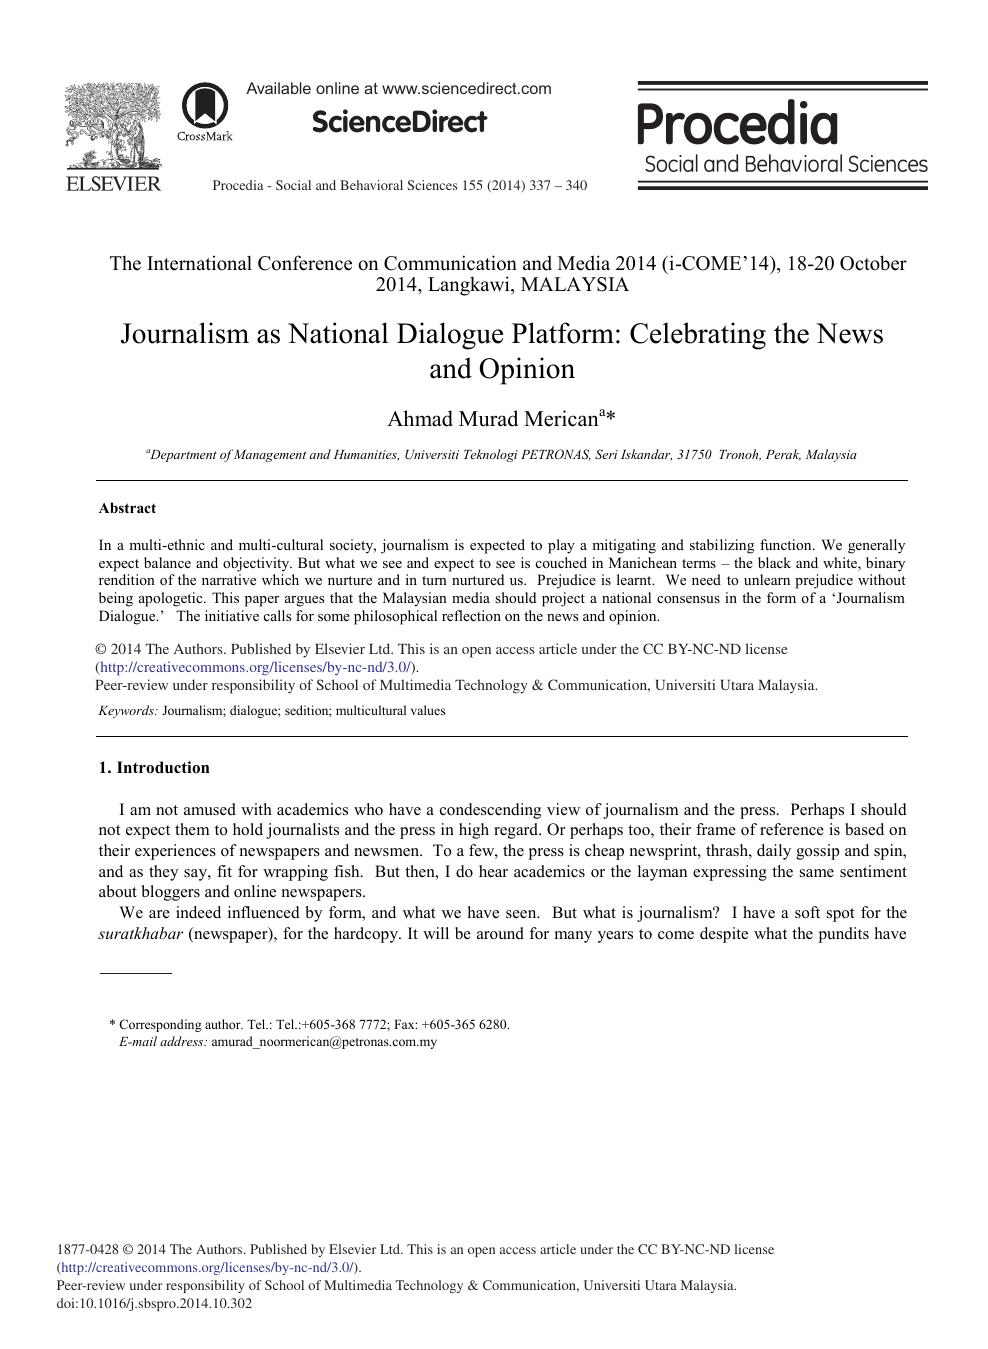 Journalism as National Dialogue Platform: Celebrating the